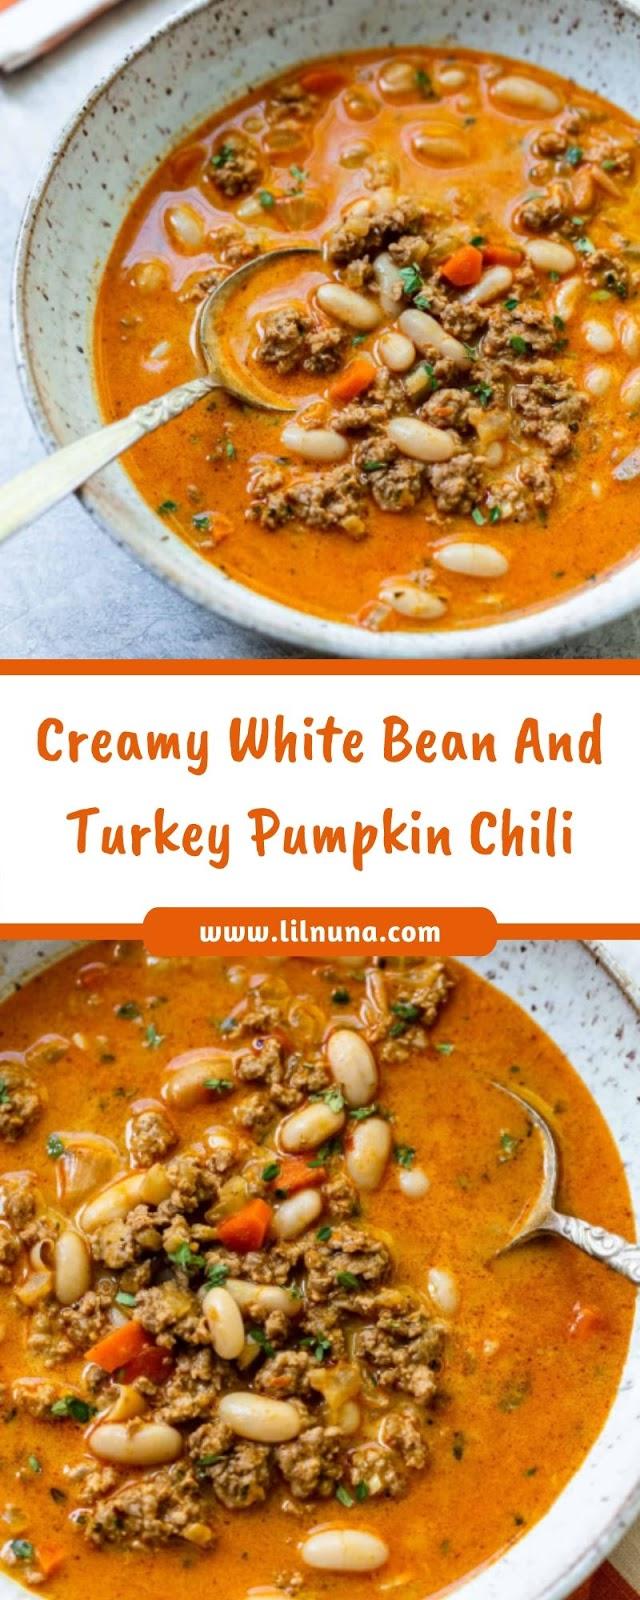 Creamy White Bean And Turkey Pumpkin Chili